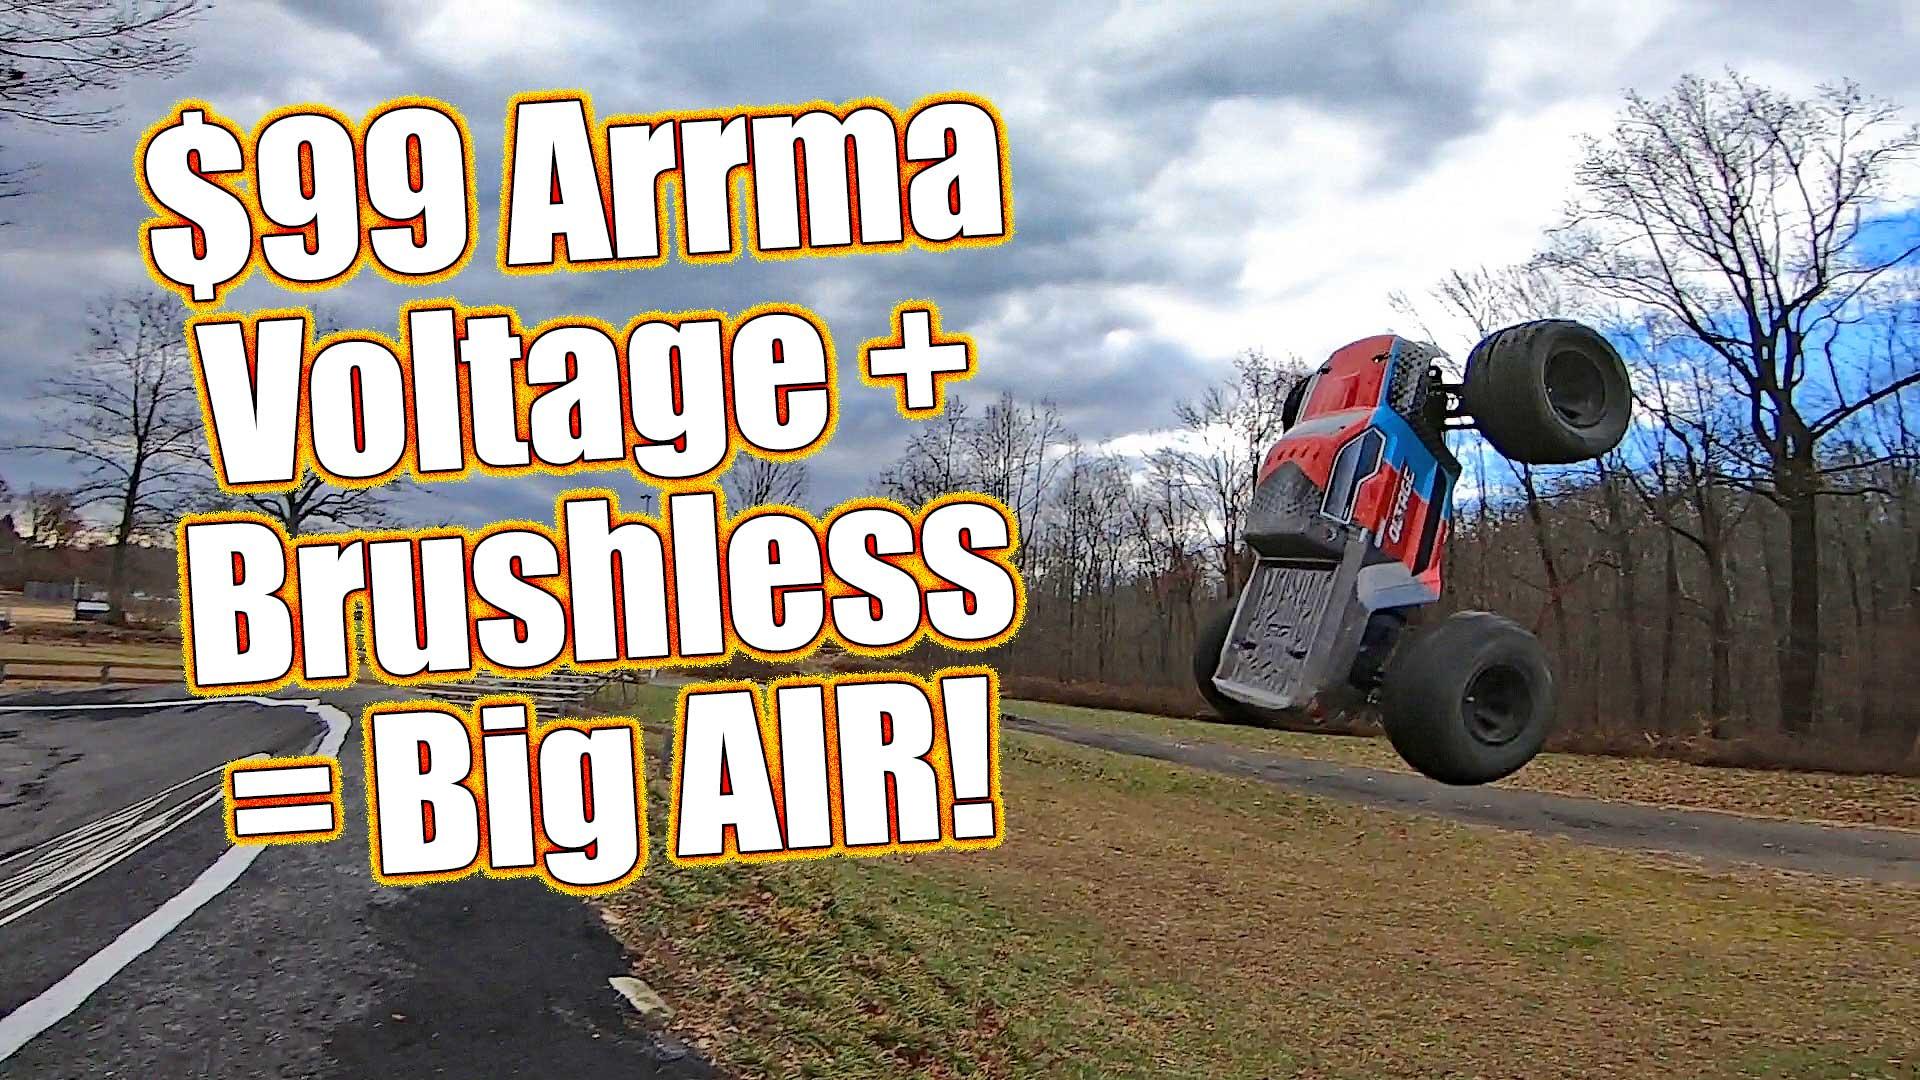 Arrma Granite Voltage Brushless Upgrade How To